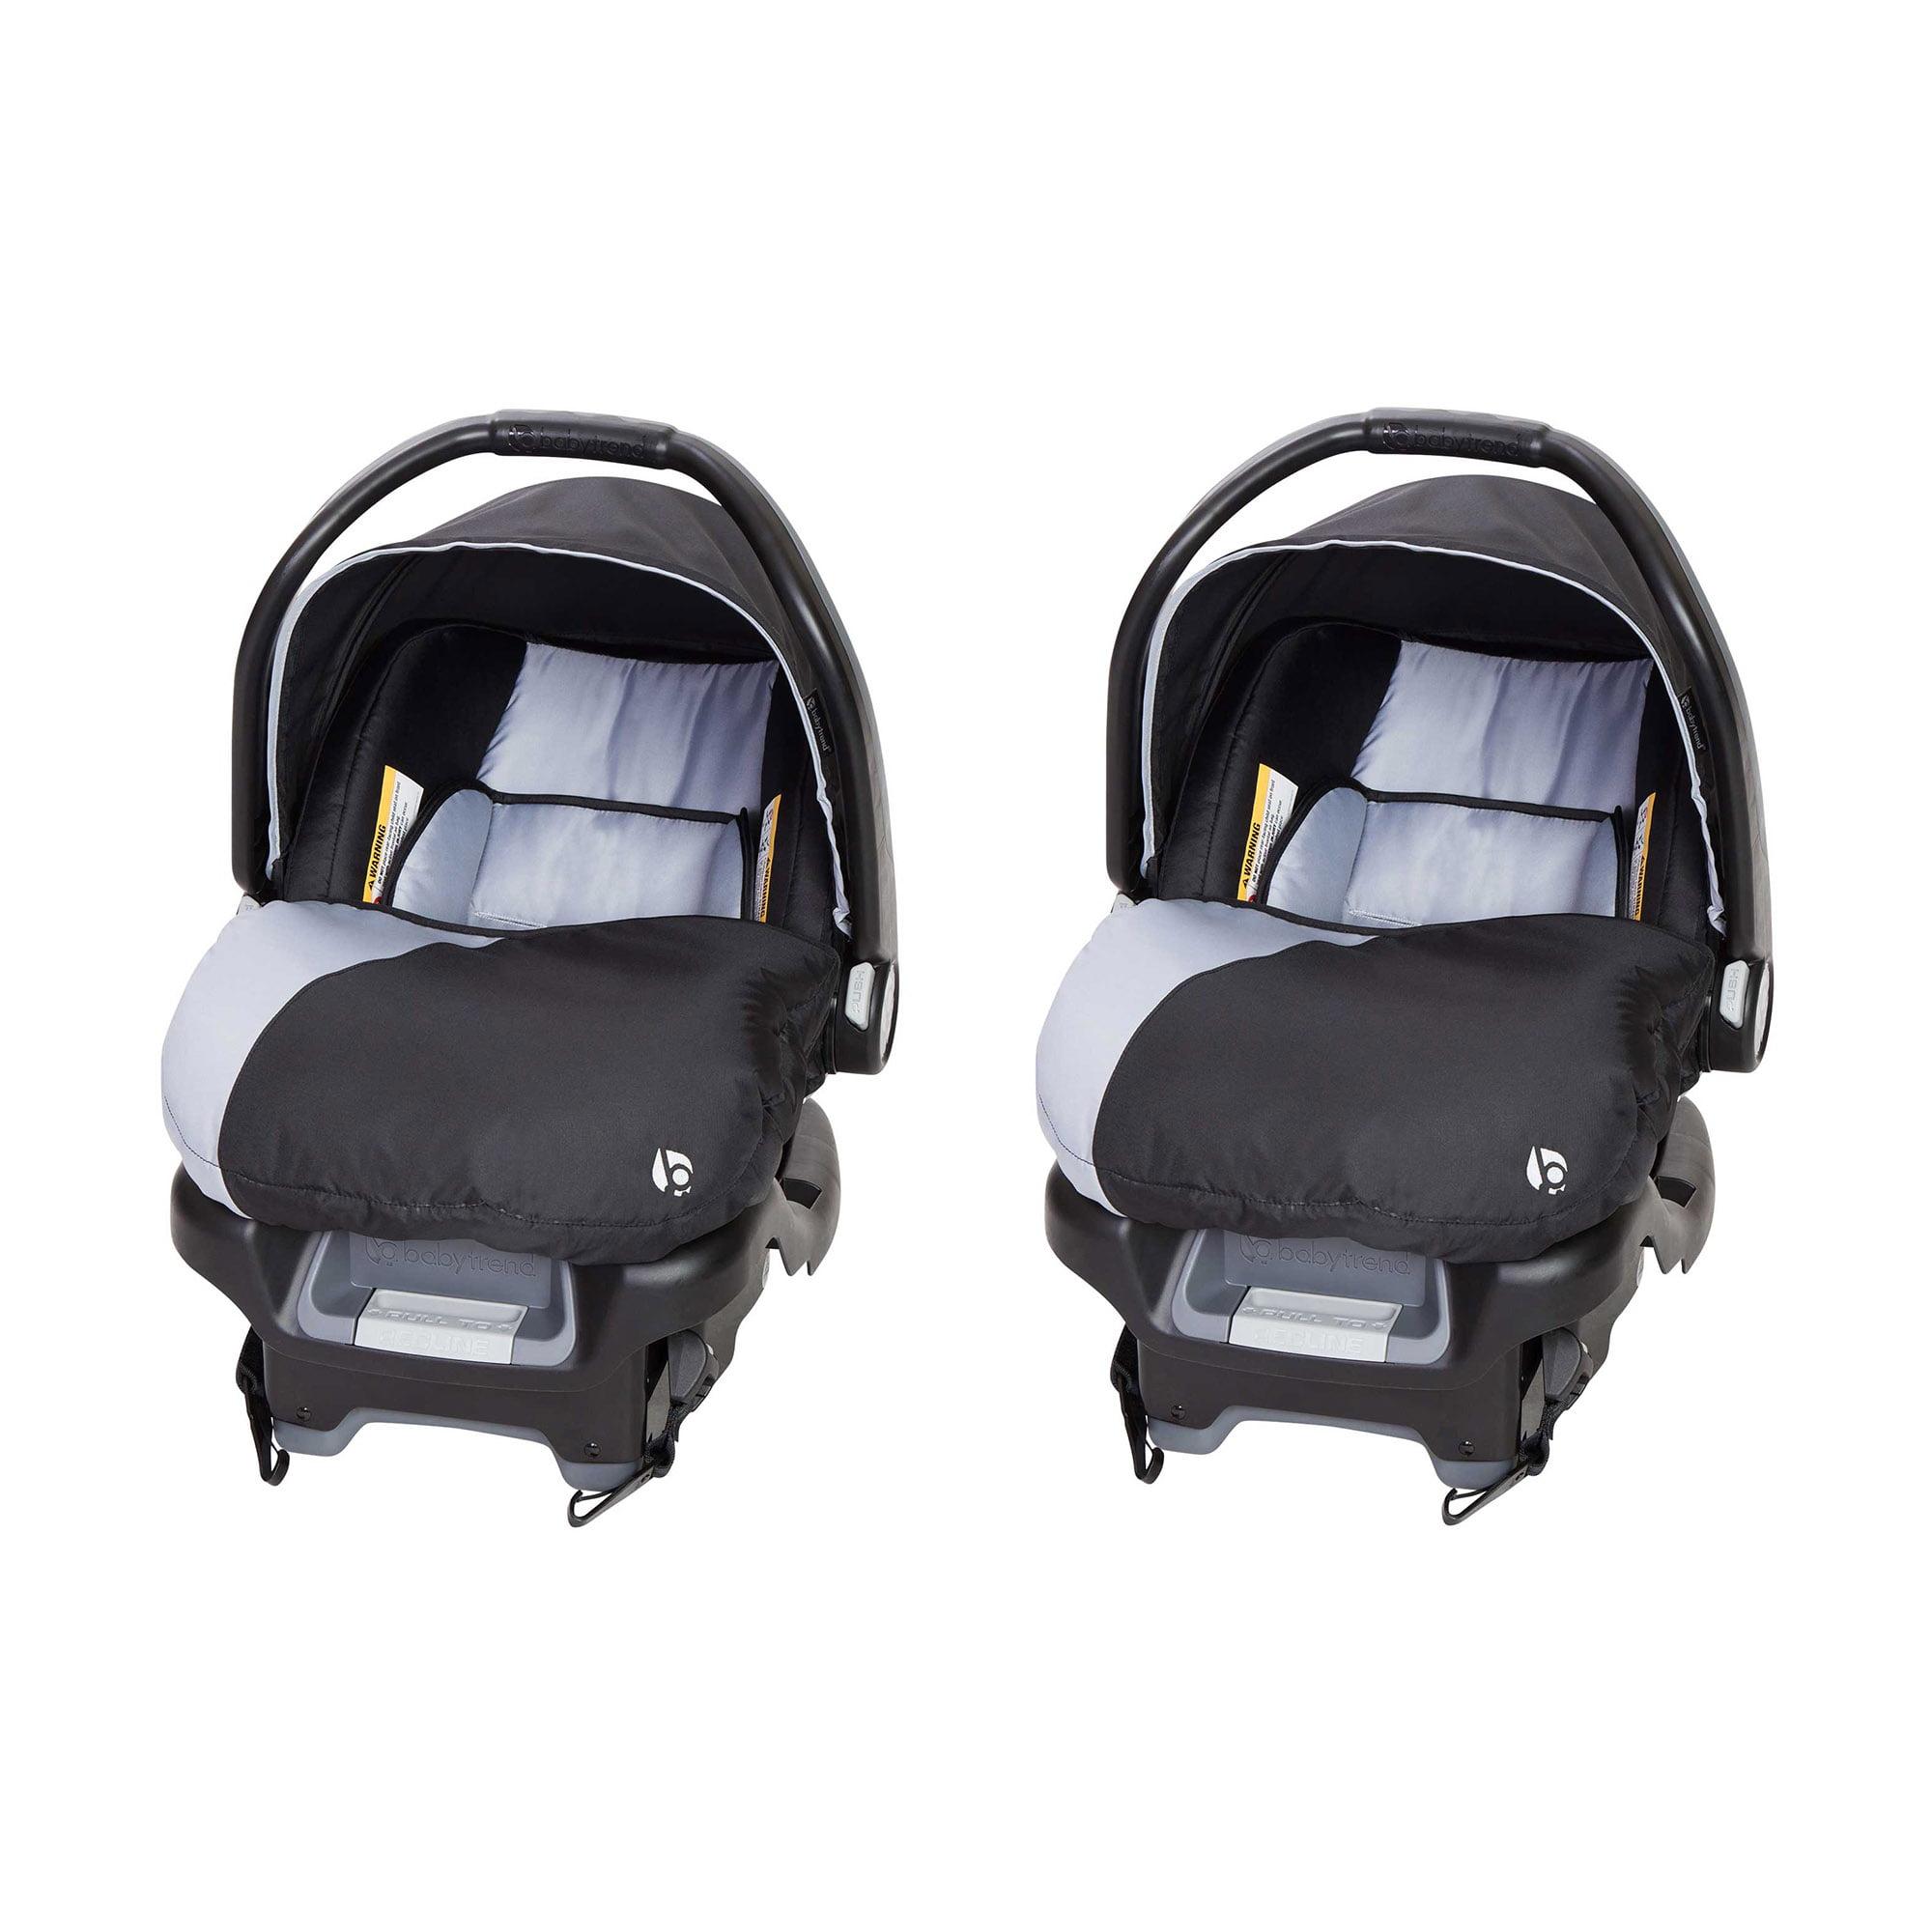 Baby Trend Flex-Loc Adjustable 35 Pound Infant Car Seat & Base, Stormy (2 Pack)